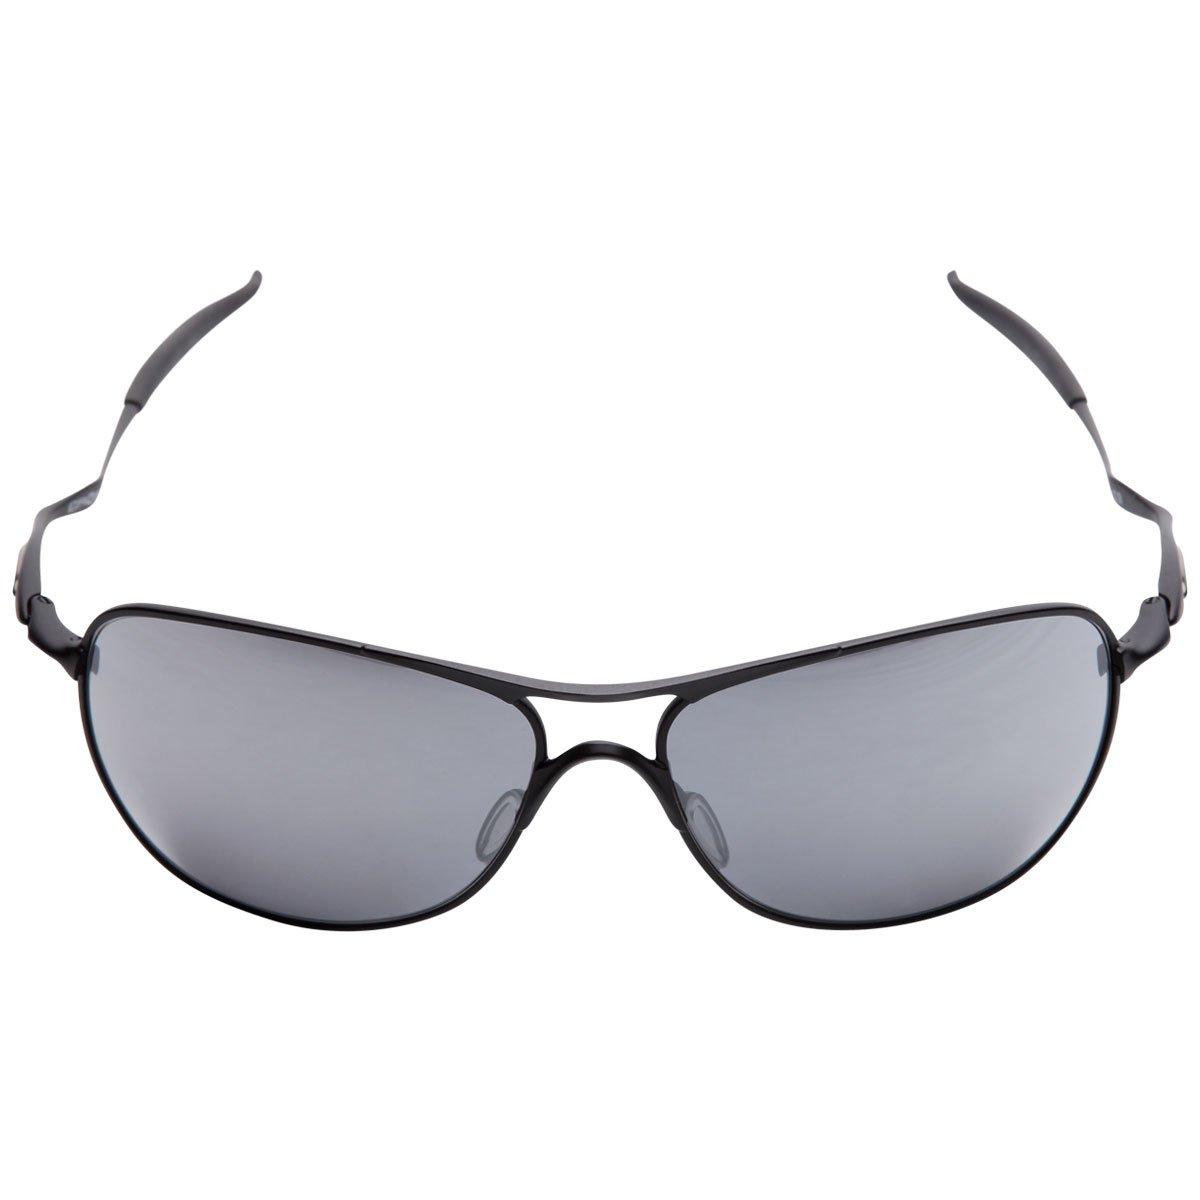 Óculos Oakley Crosshair - Iridium  Óculos Oakley Crosshair - Iridium 19b3359772